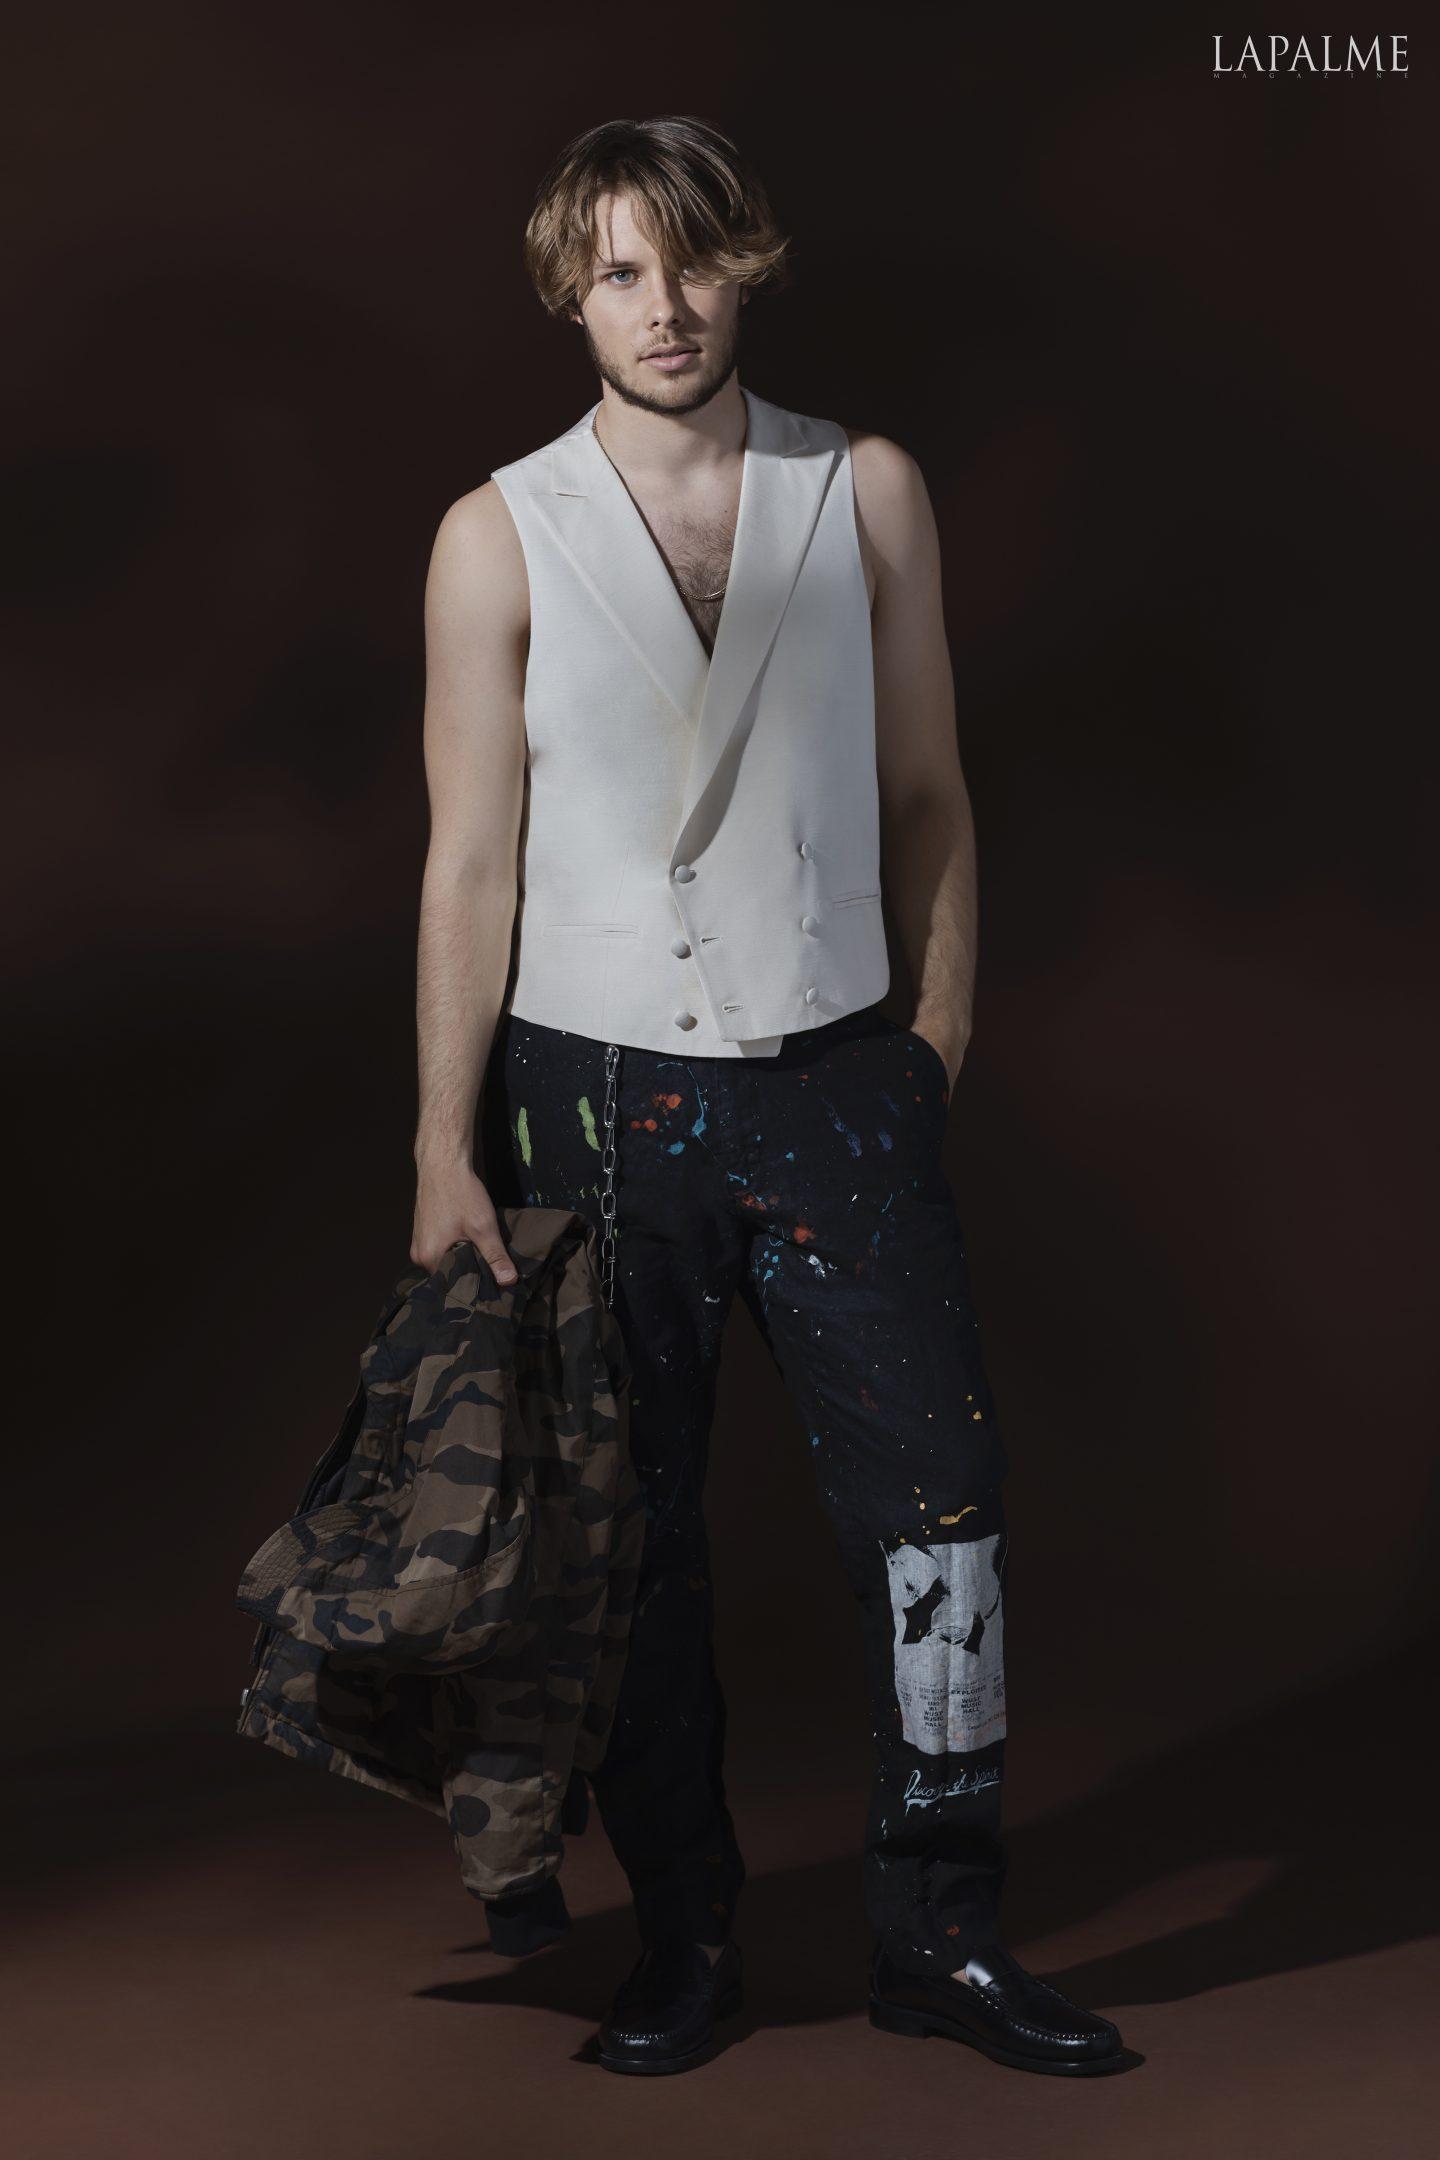 Chain: Stylist Own Jacket: Lucky Brand Vest: Joseph Abboud Black Label SS19 Pants: Glass Shoes: Sebago